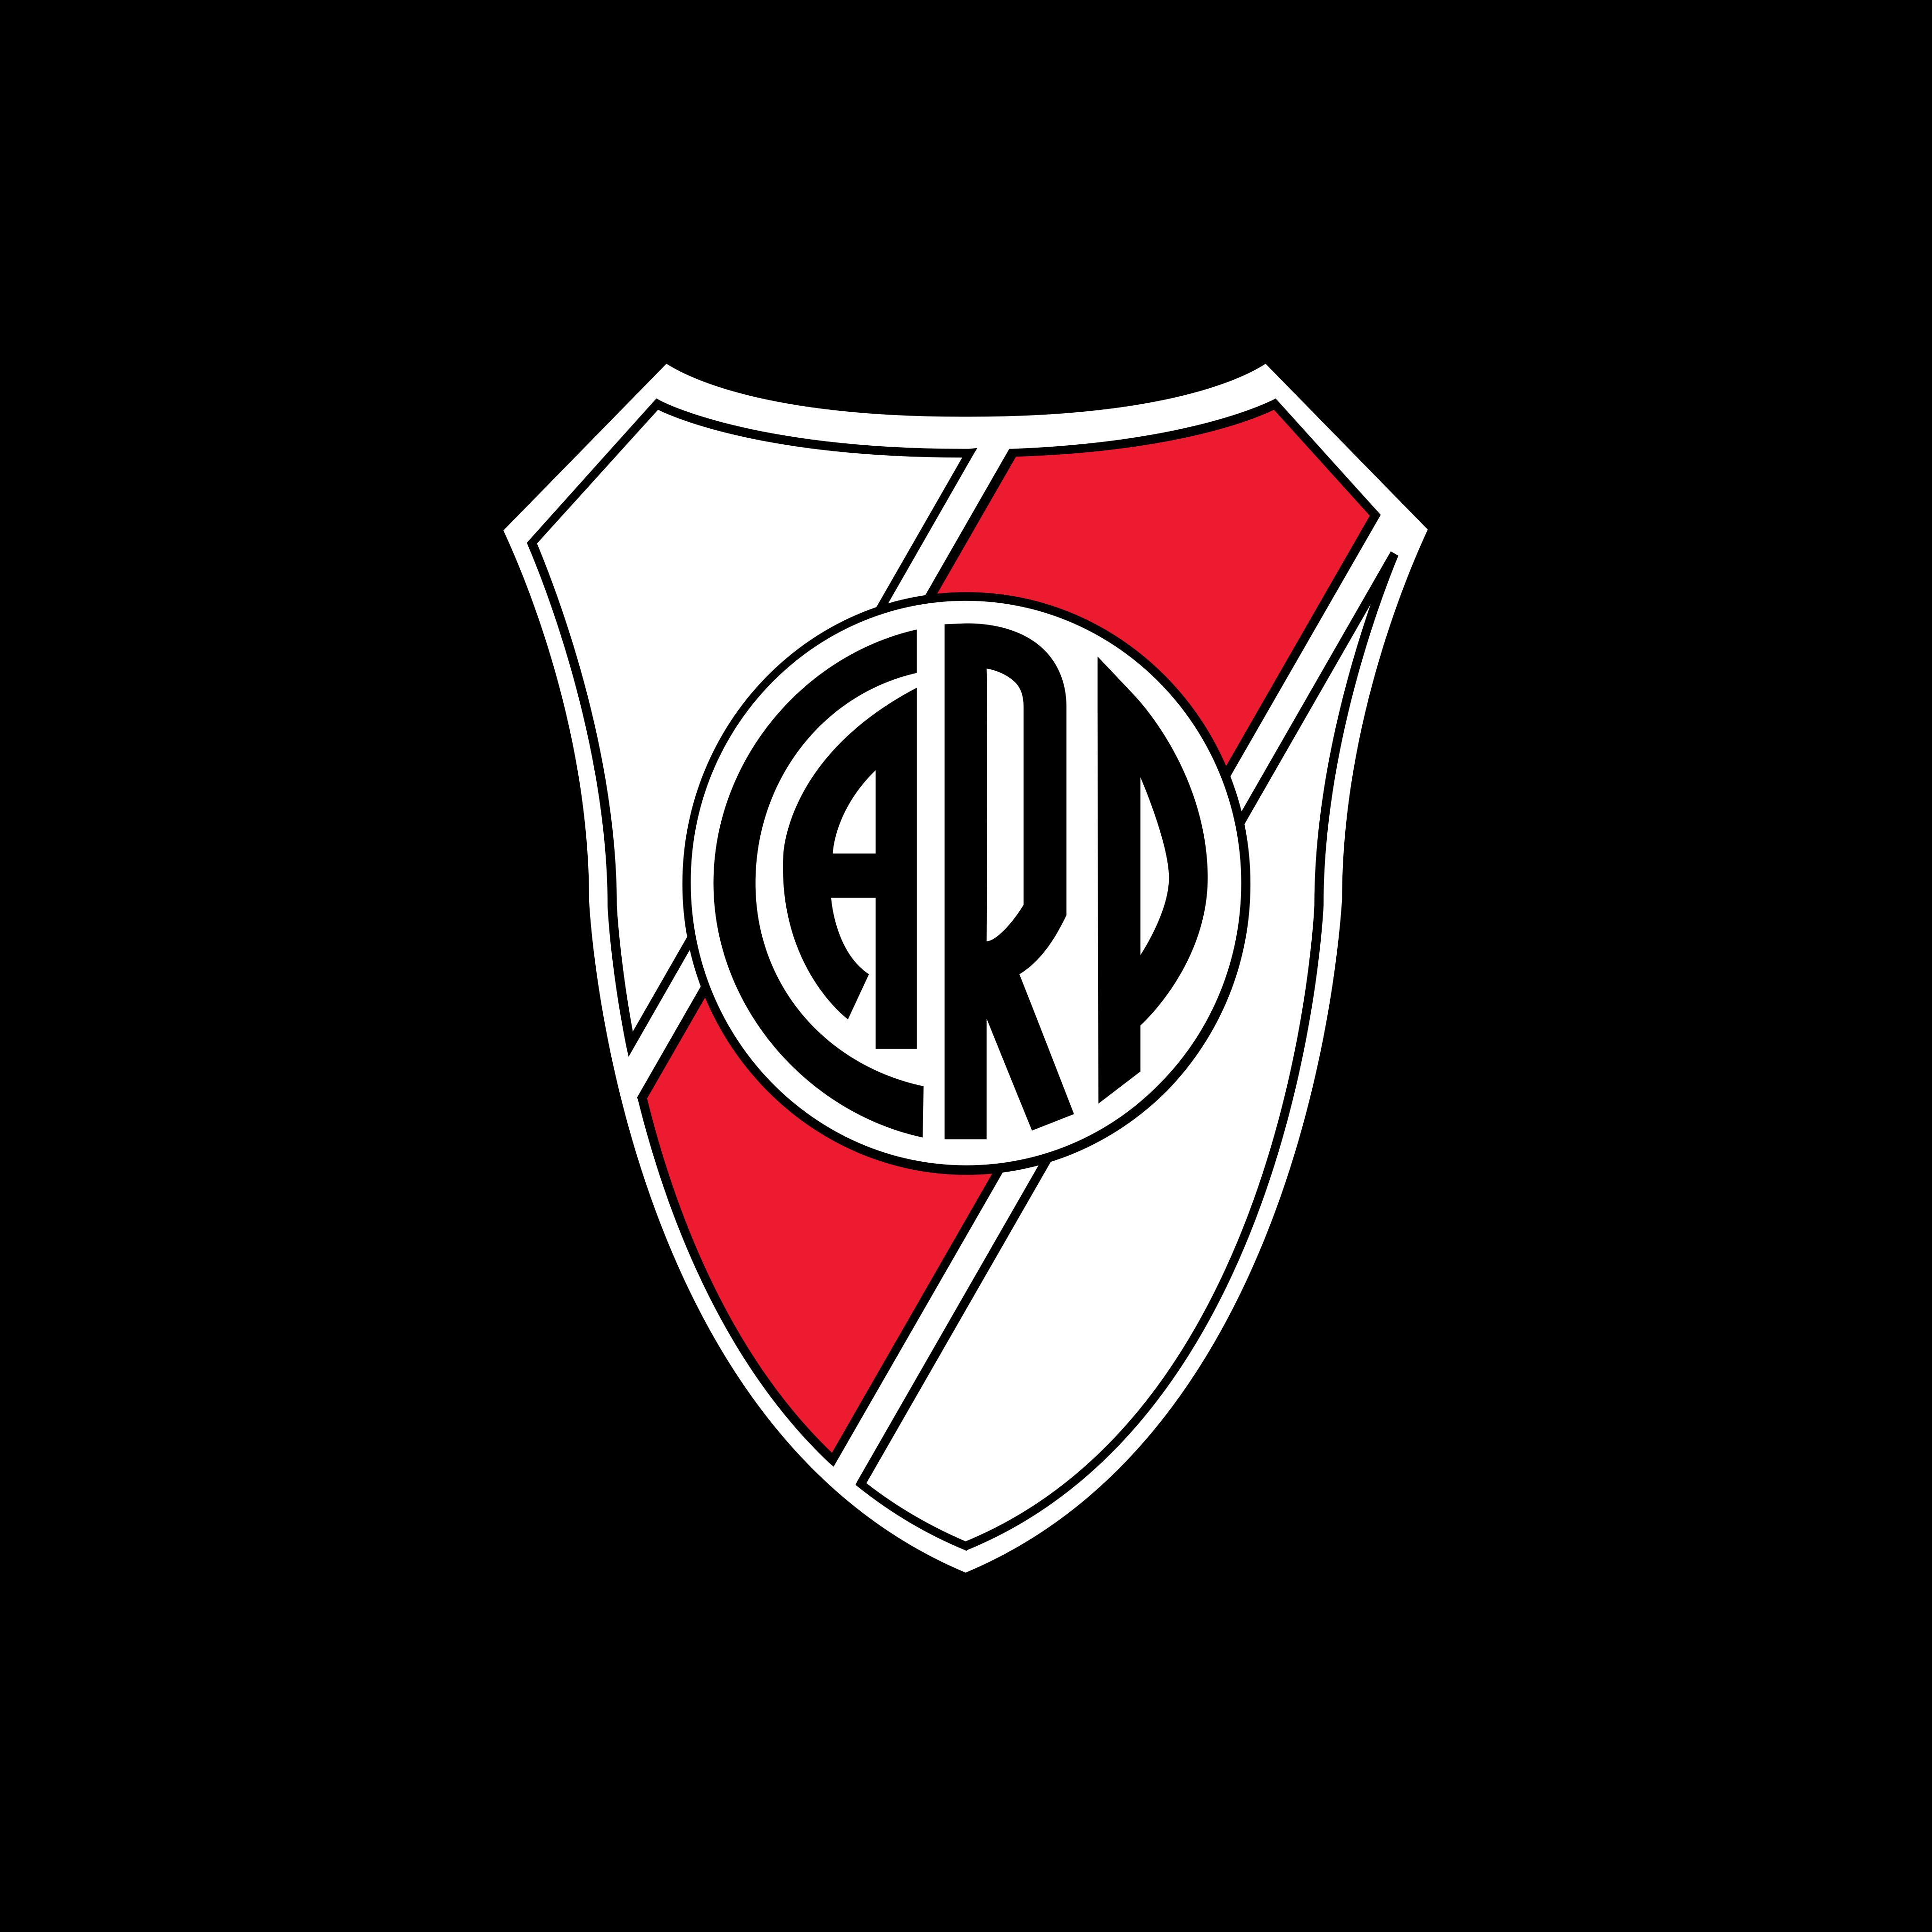 river plate logo 0 - River Plate Logo